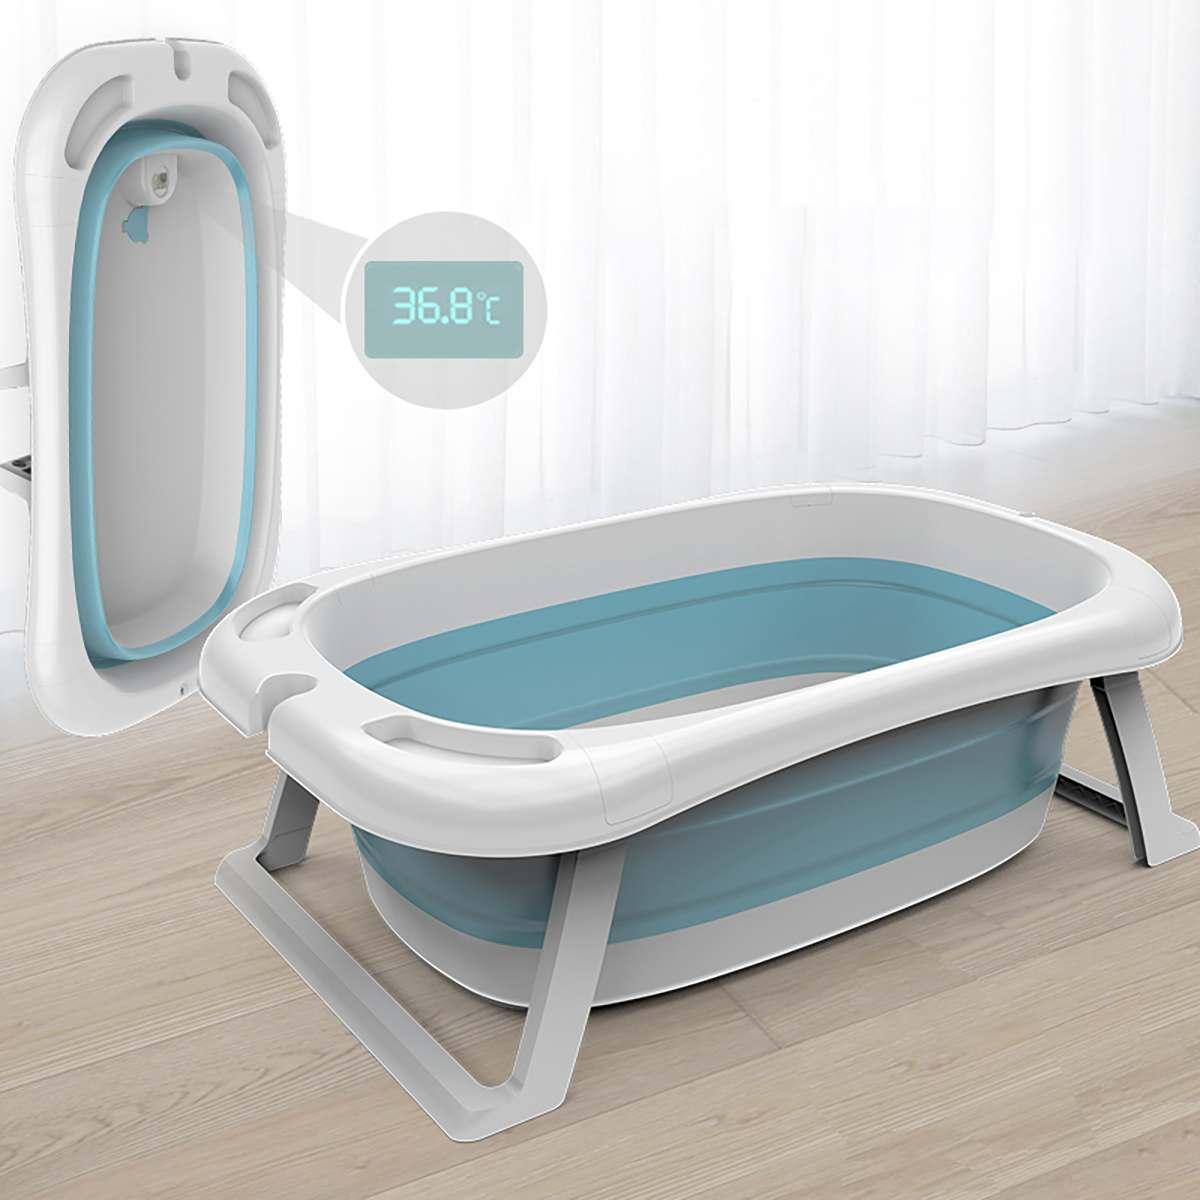 Folding Bathtub Baby Children Lying Universal Intelligent Temperature Bath Barrel Baby Newborn Supplies Oversize Baby Bath Tub enlarge